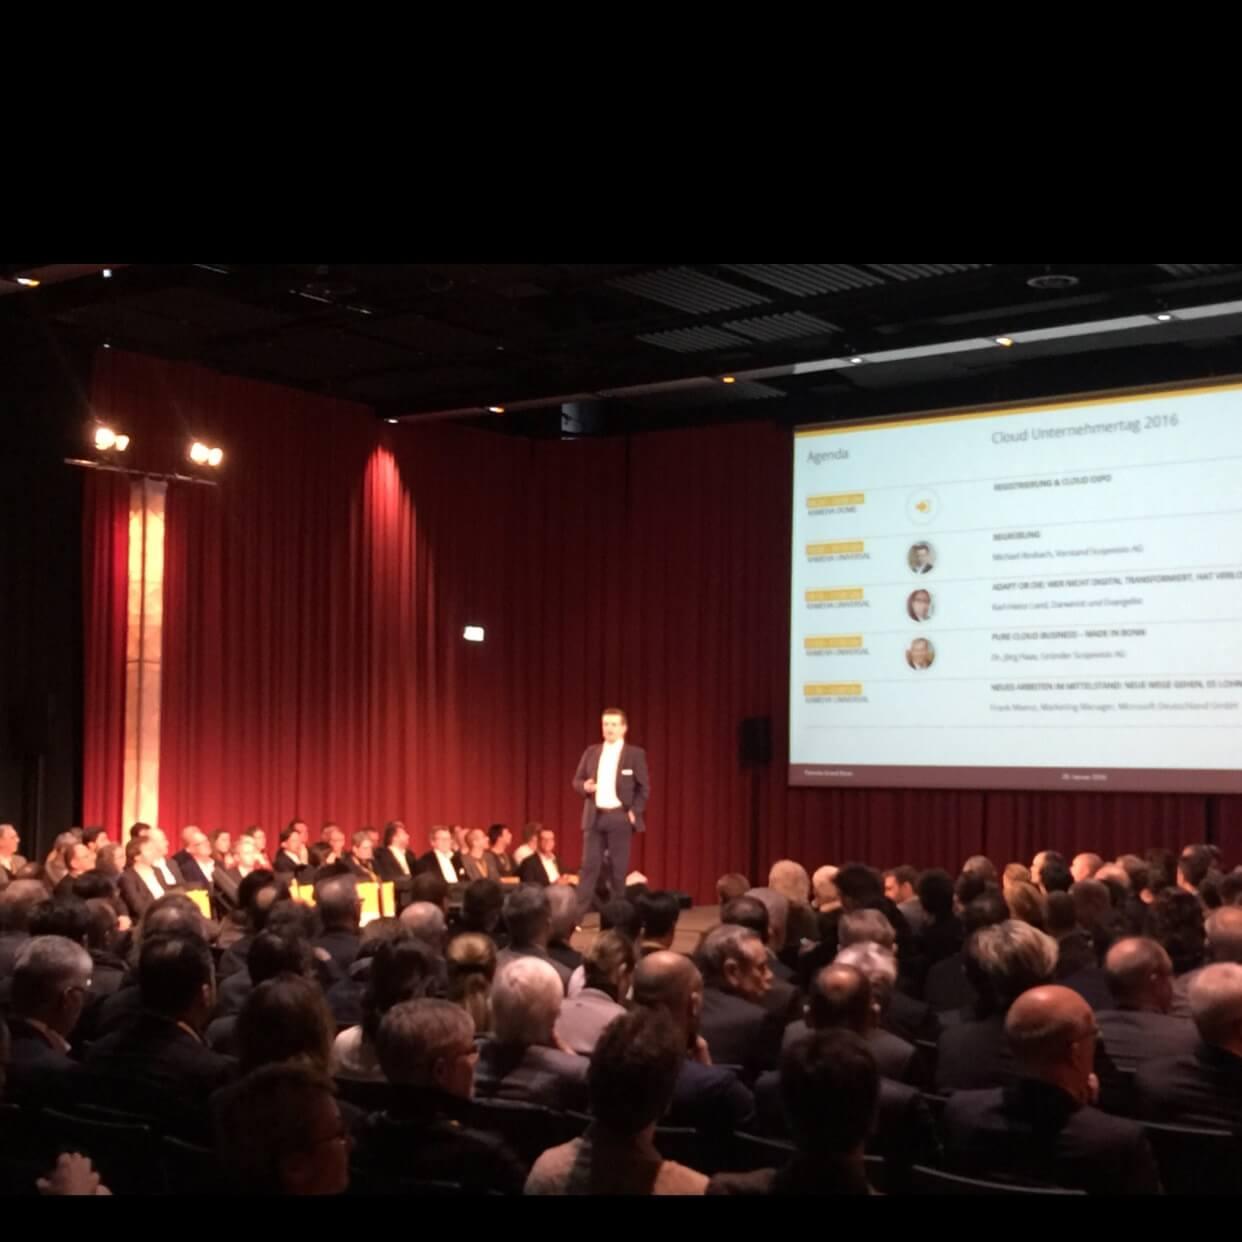 Michael Rosbach, Cloud Unternehmertag 2016, CenterDevice GmbH